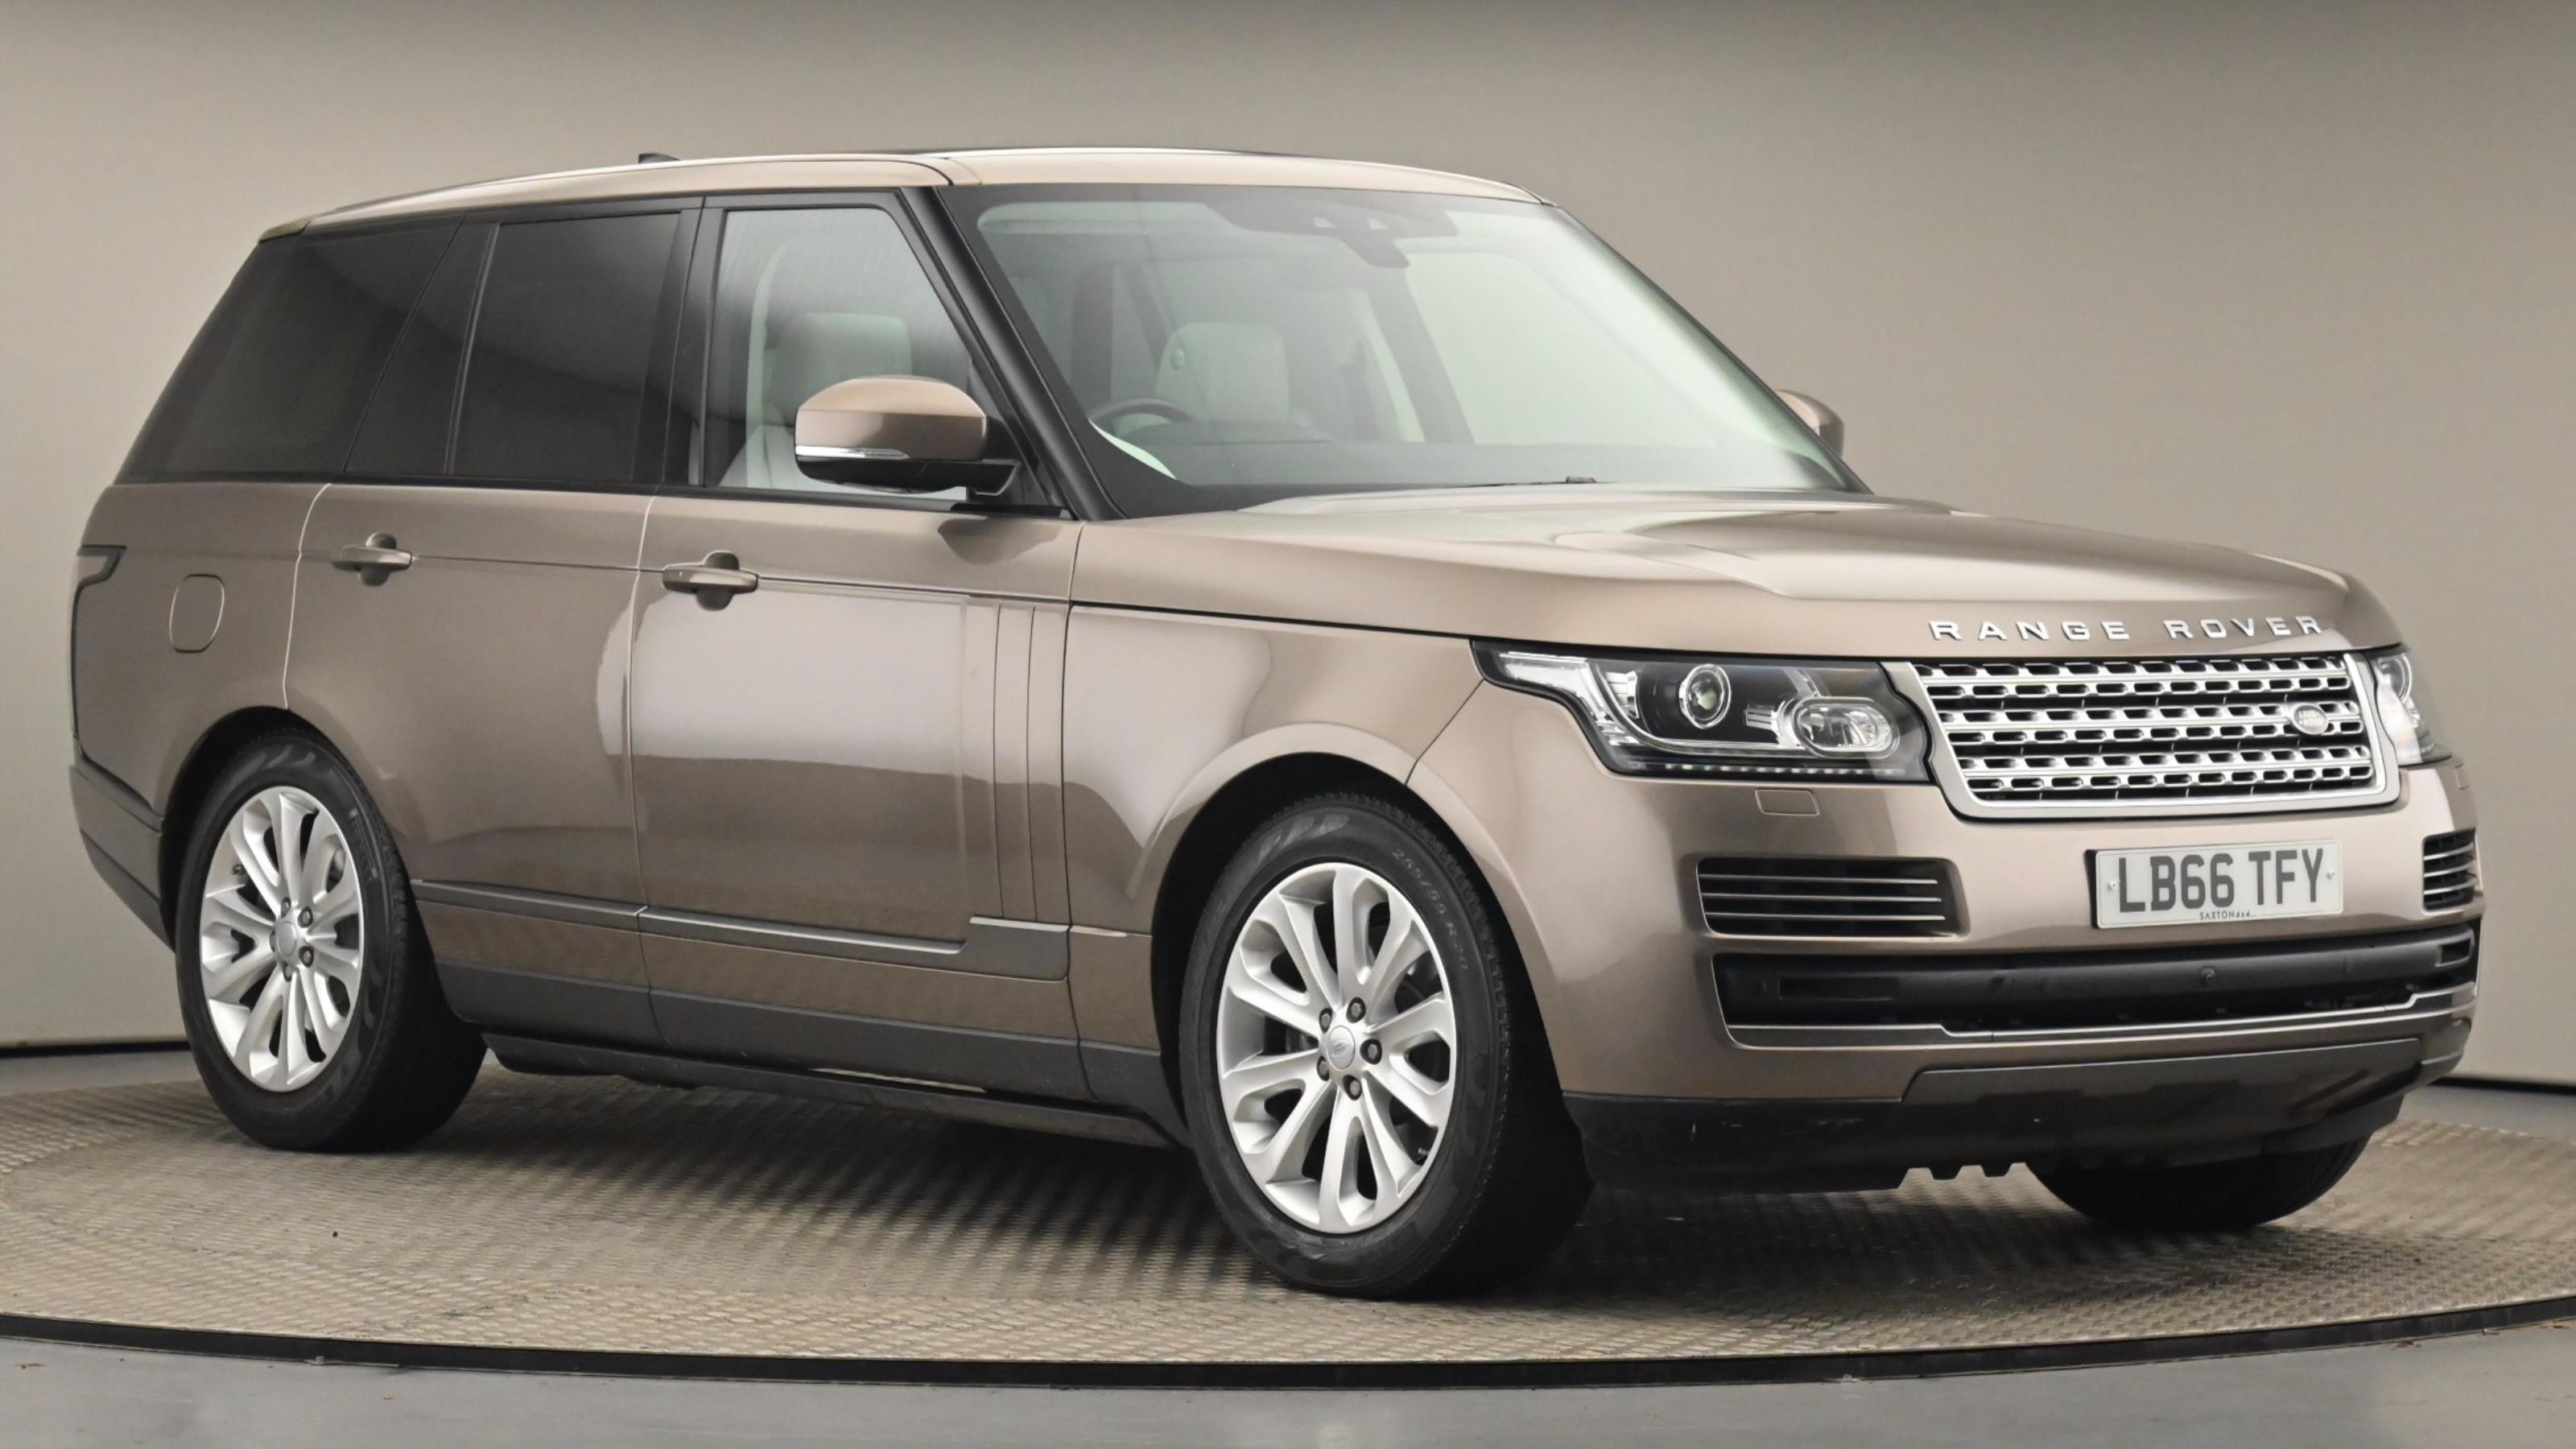 Used 2017 Land Rover RANGE ROVER 3.0 TDV6 Vogue 4dr Auto at Saxton4x4